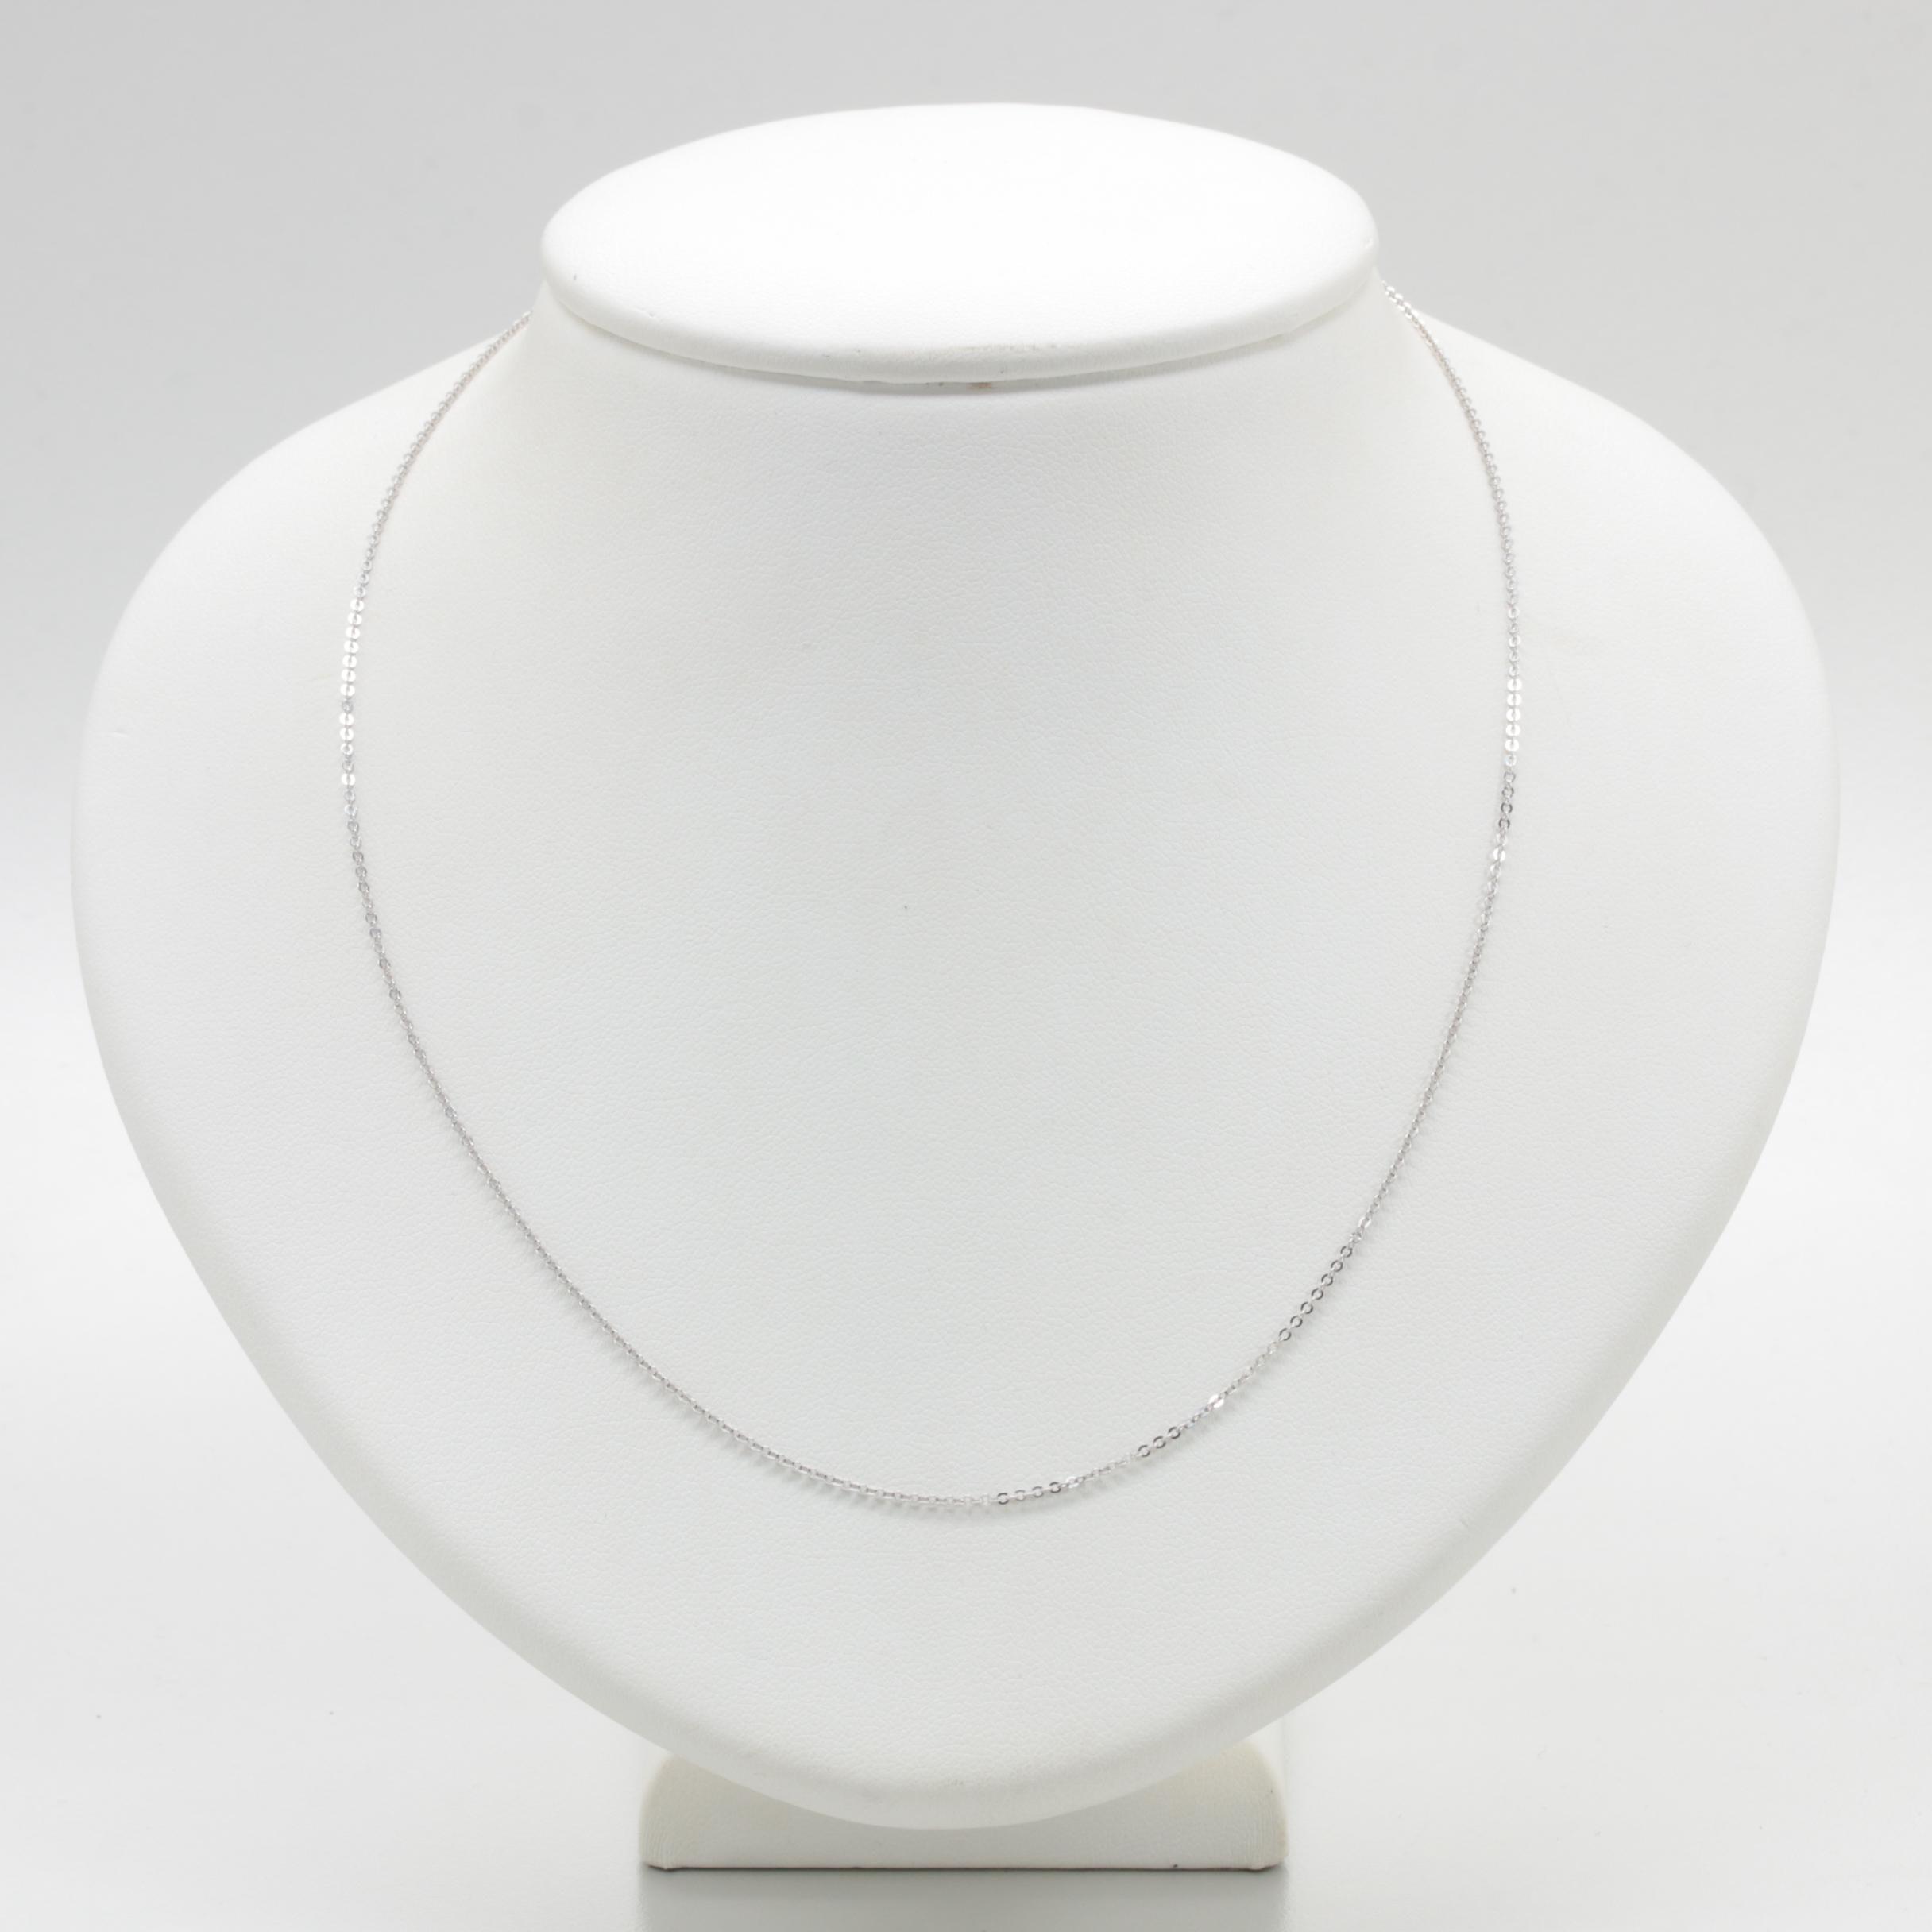 Italian 18K White Gold Rolo Chain Necklace